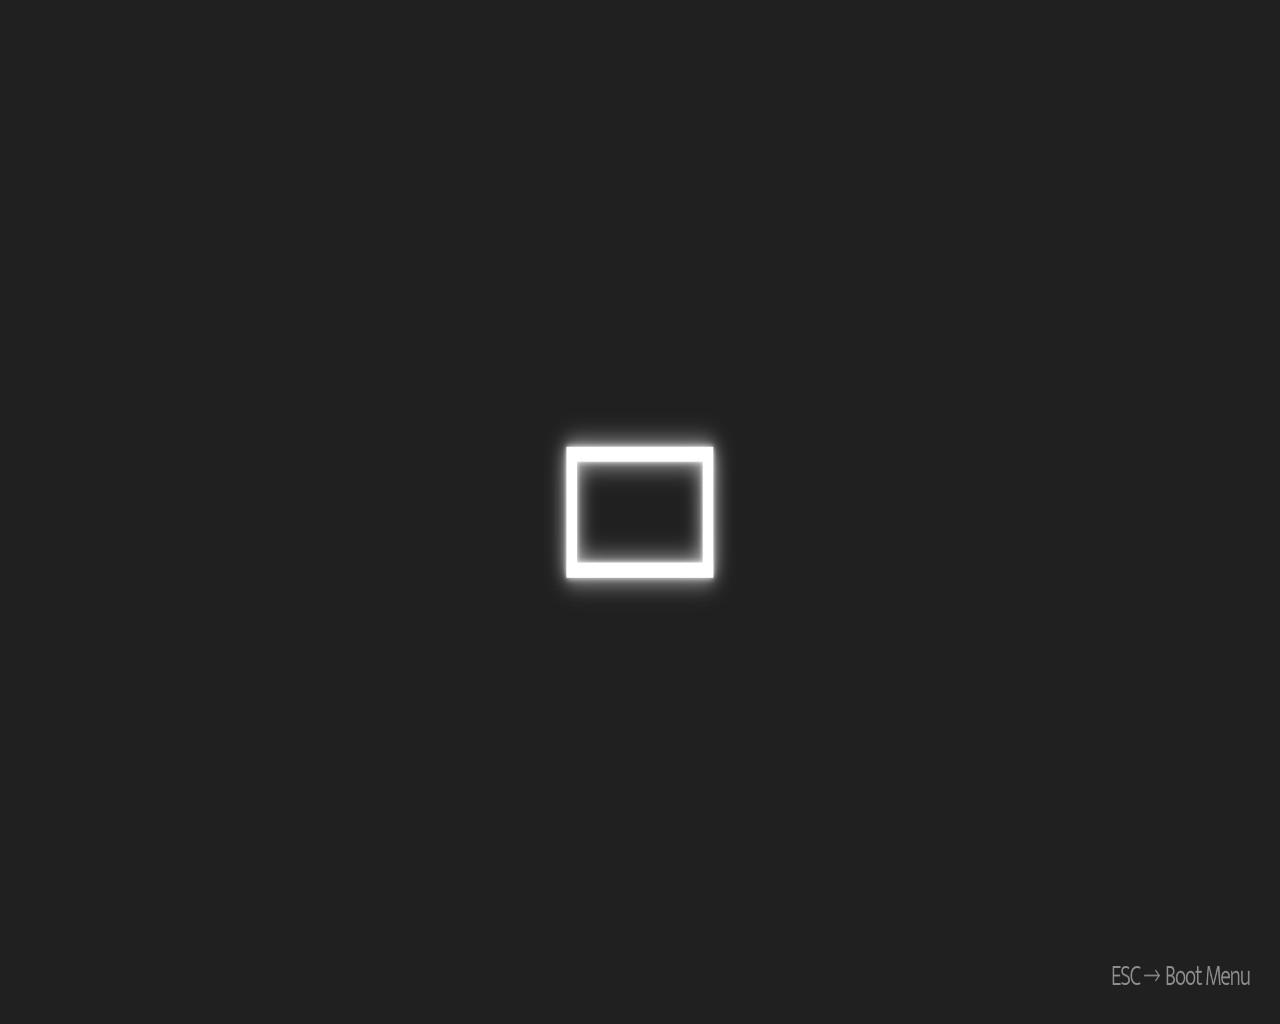 bootsplash_1280.jpg